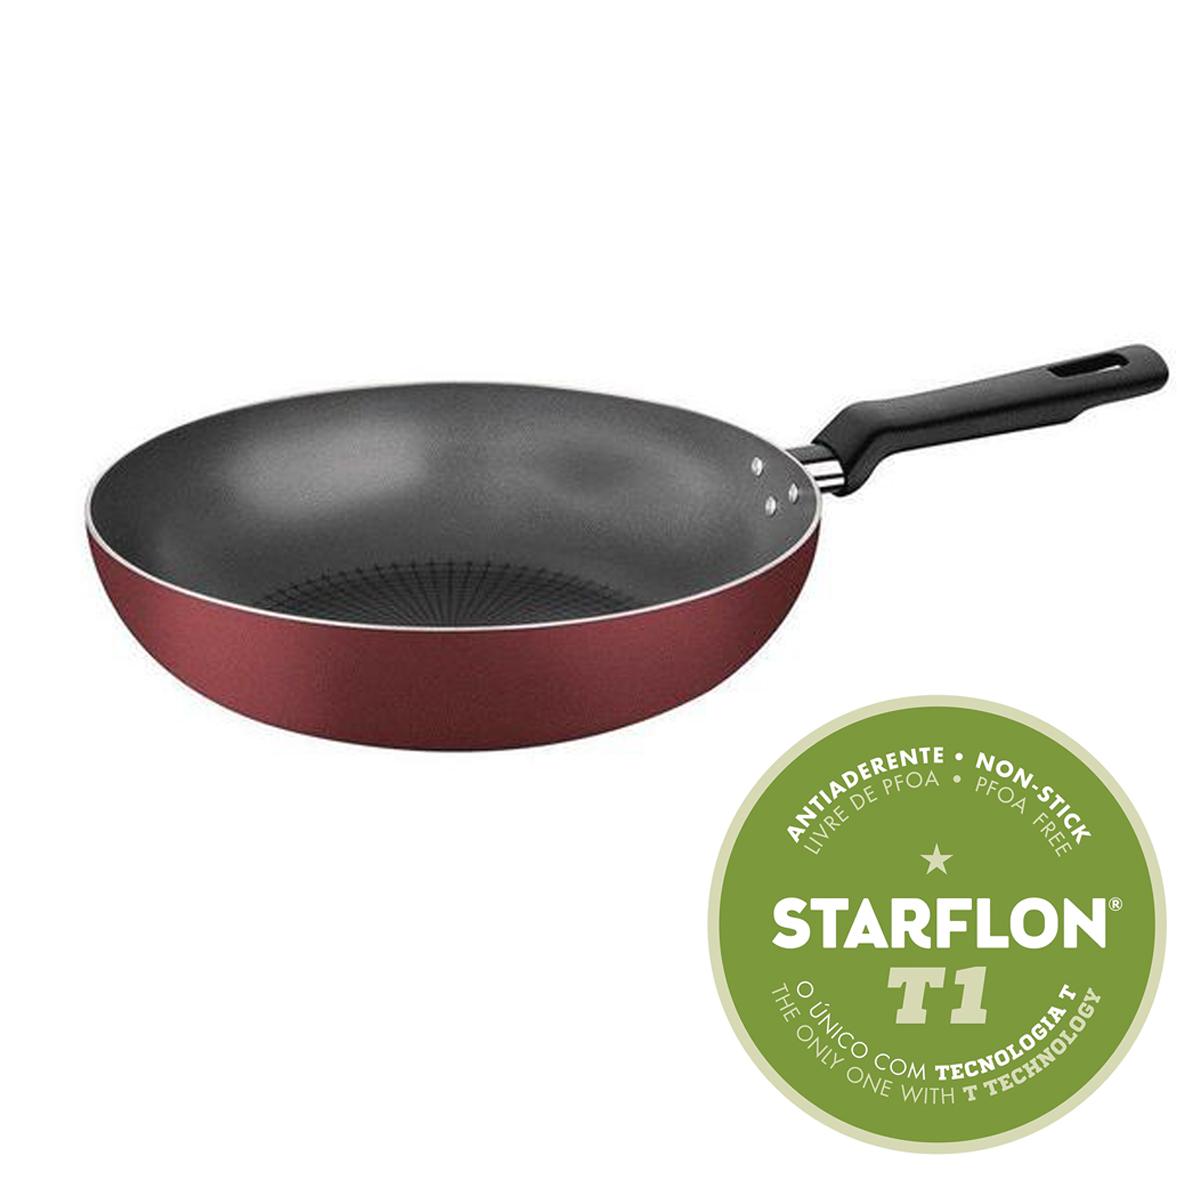 Frigideira Funda Tramontina Loreto Vermelha Antiaderente Starflon T1